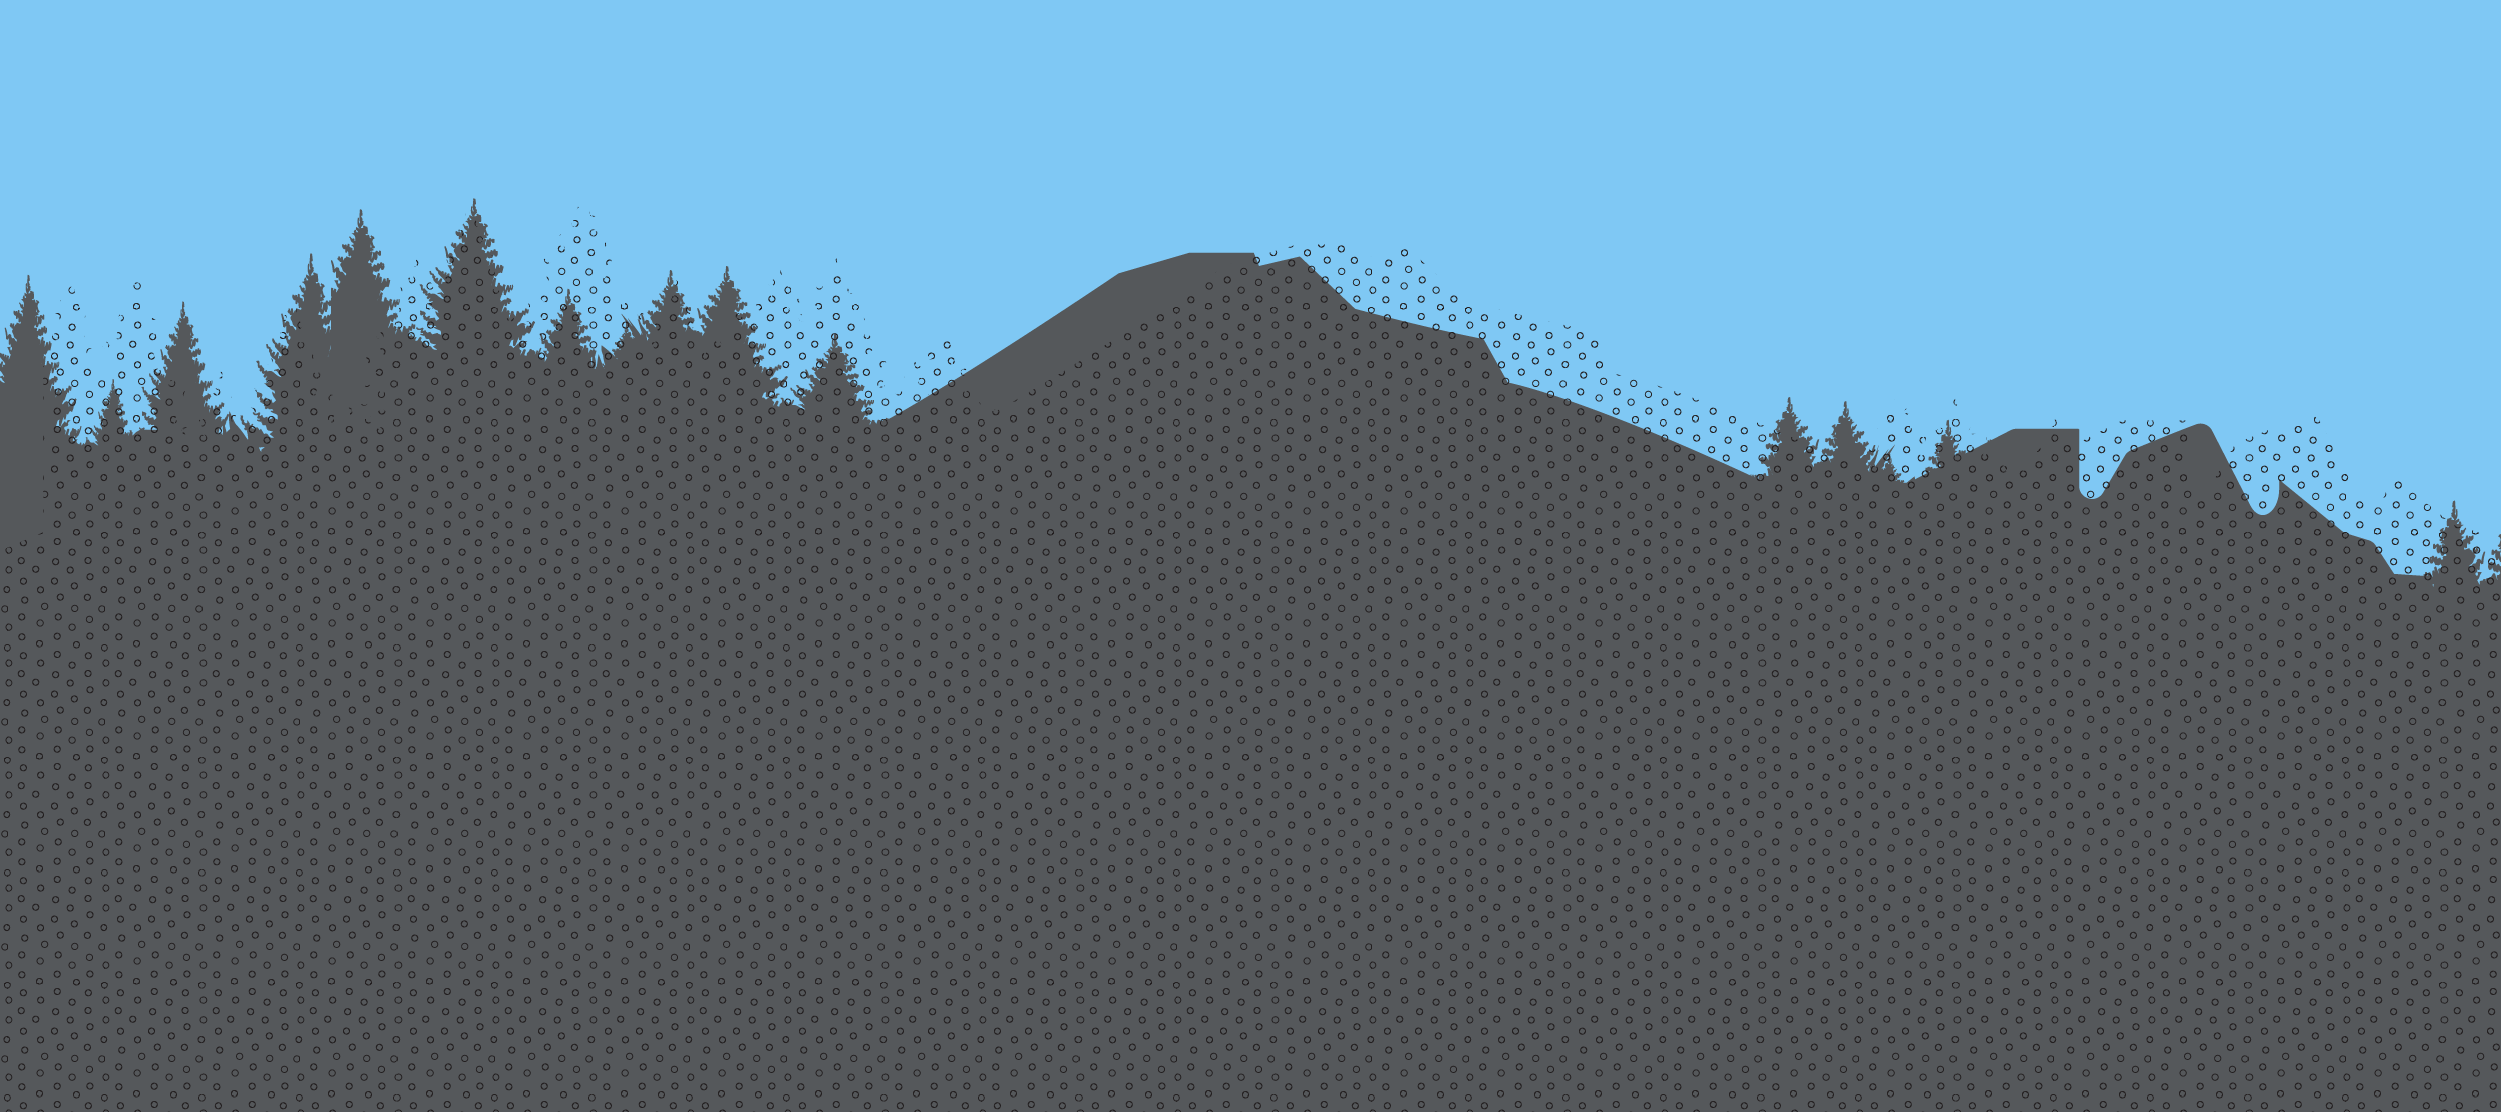 mountains_LPimage_blue-01.png